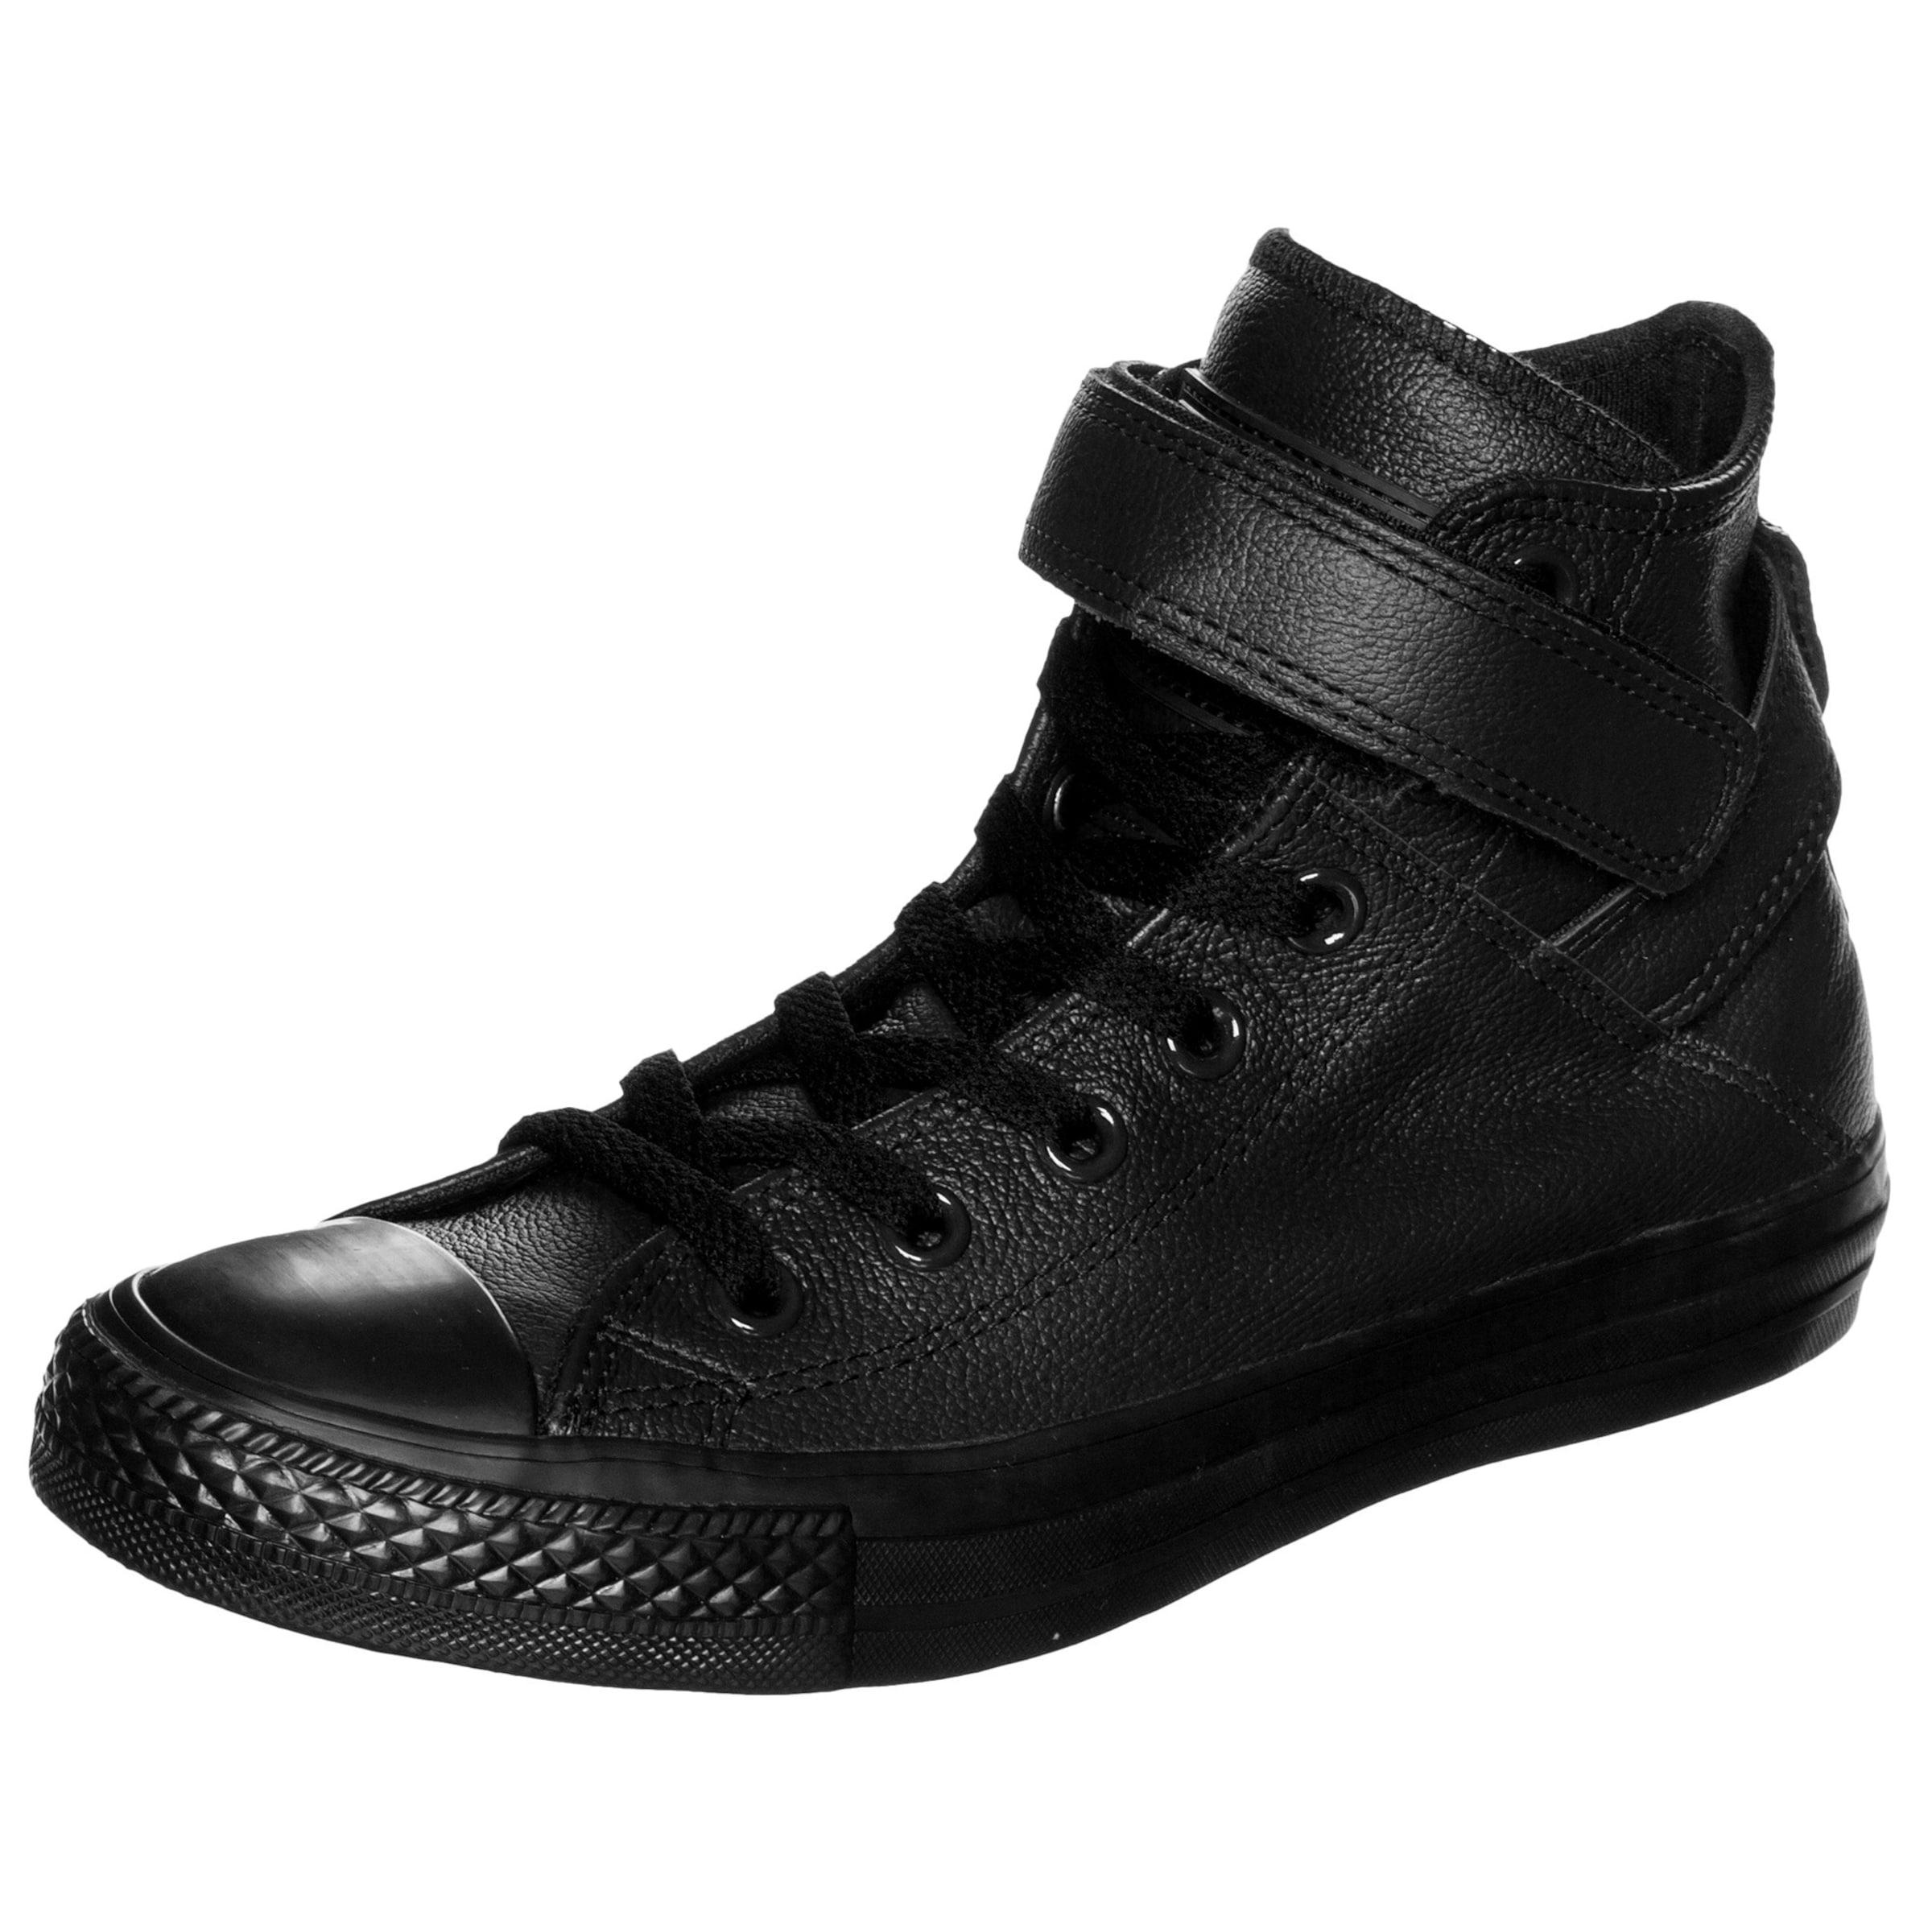 Converse Sneaker Star In Schwarz All Taylor 'chuck Brea' ZPkiuXO